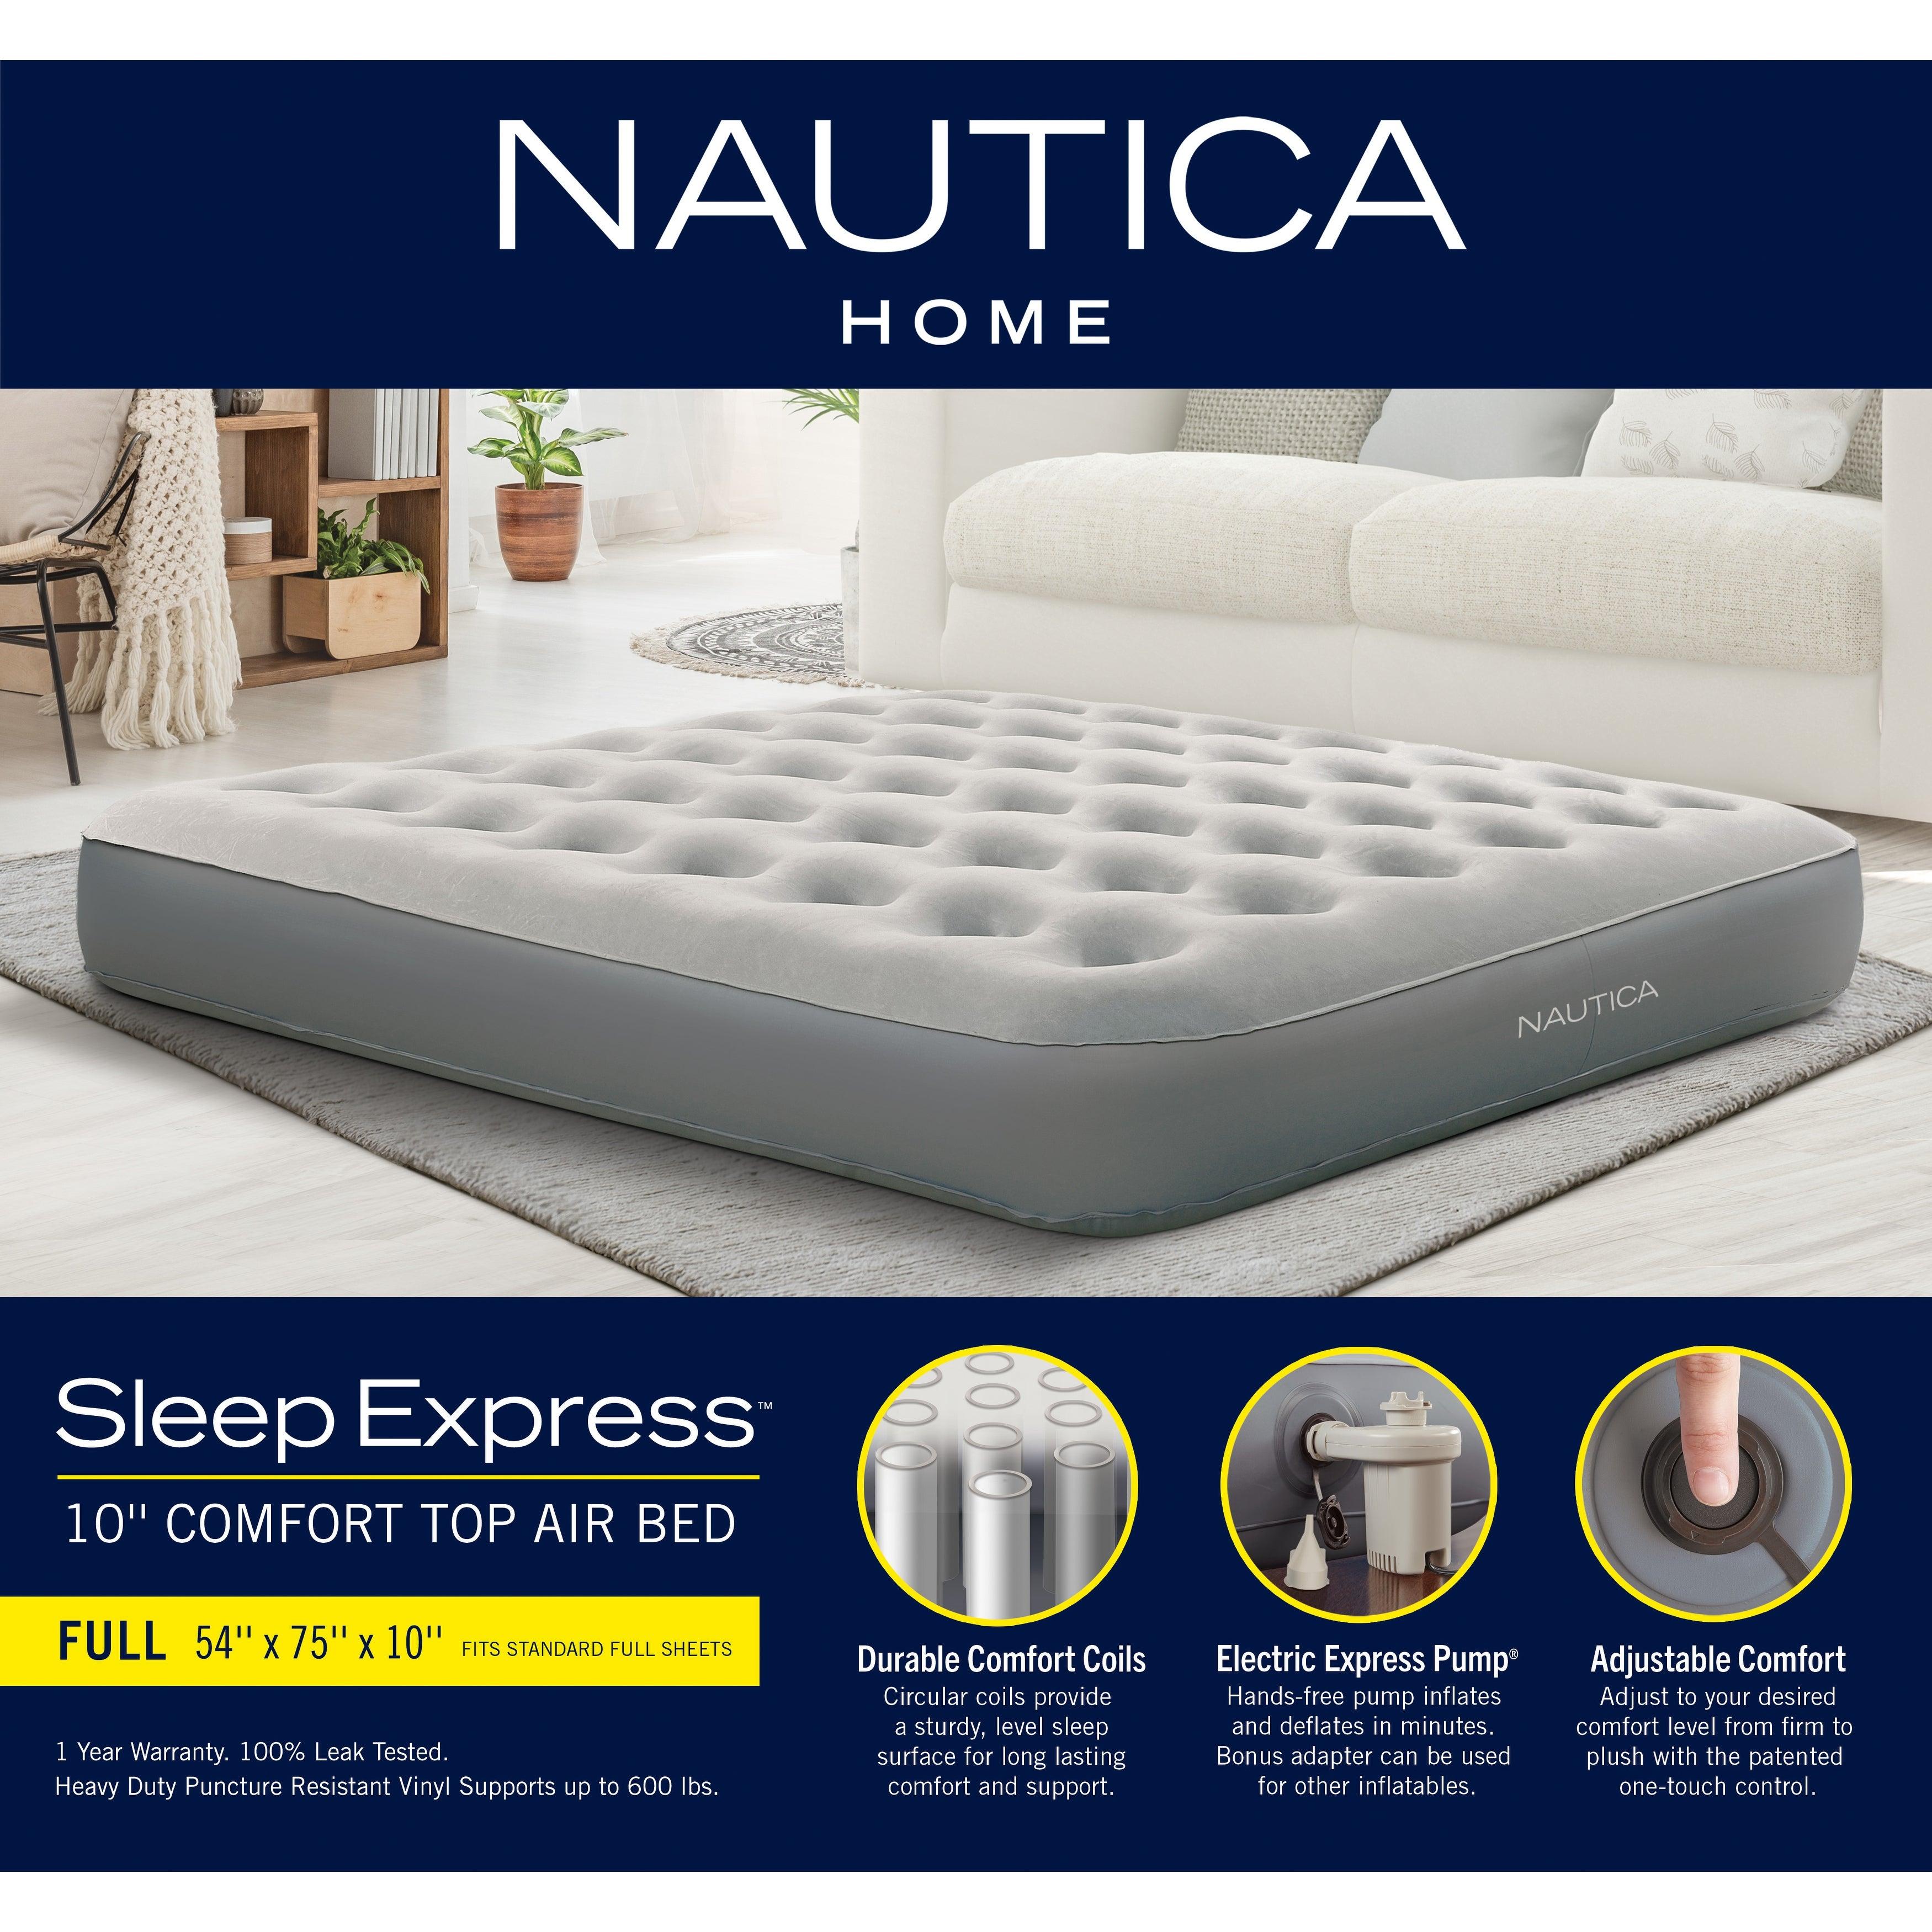 Nautica Home 10 Sleep Express Air Bed Mattress On Sale Overstock 32254451